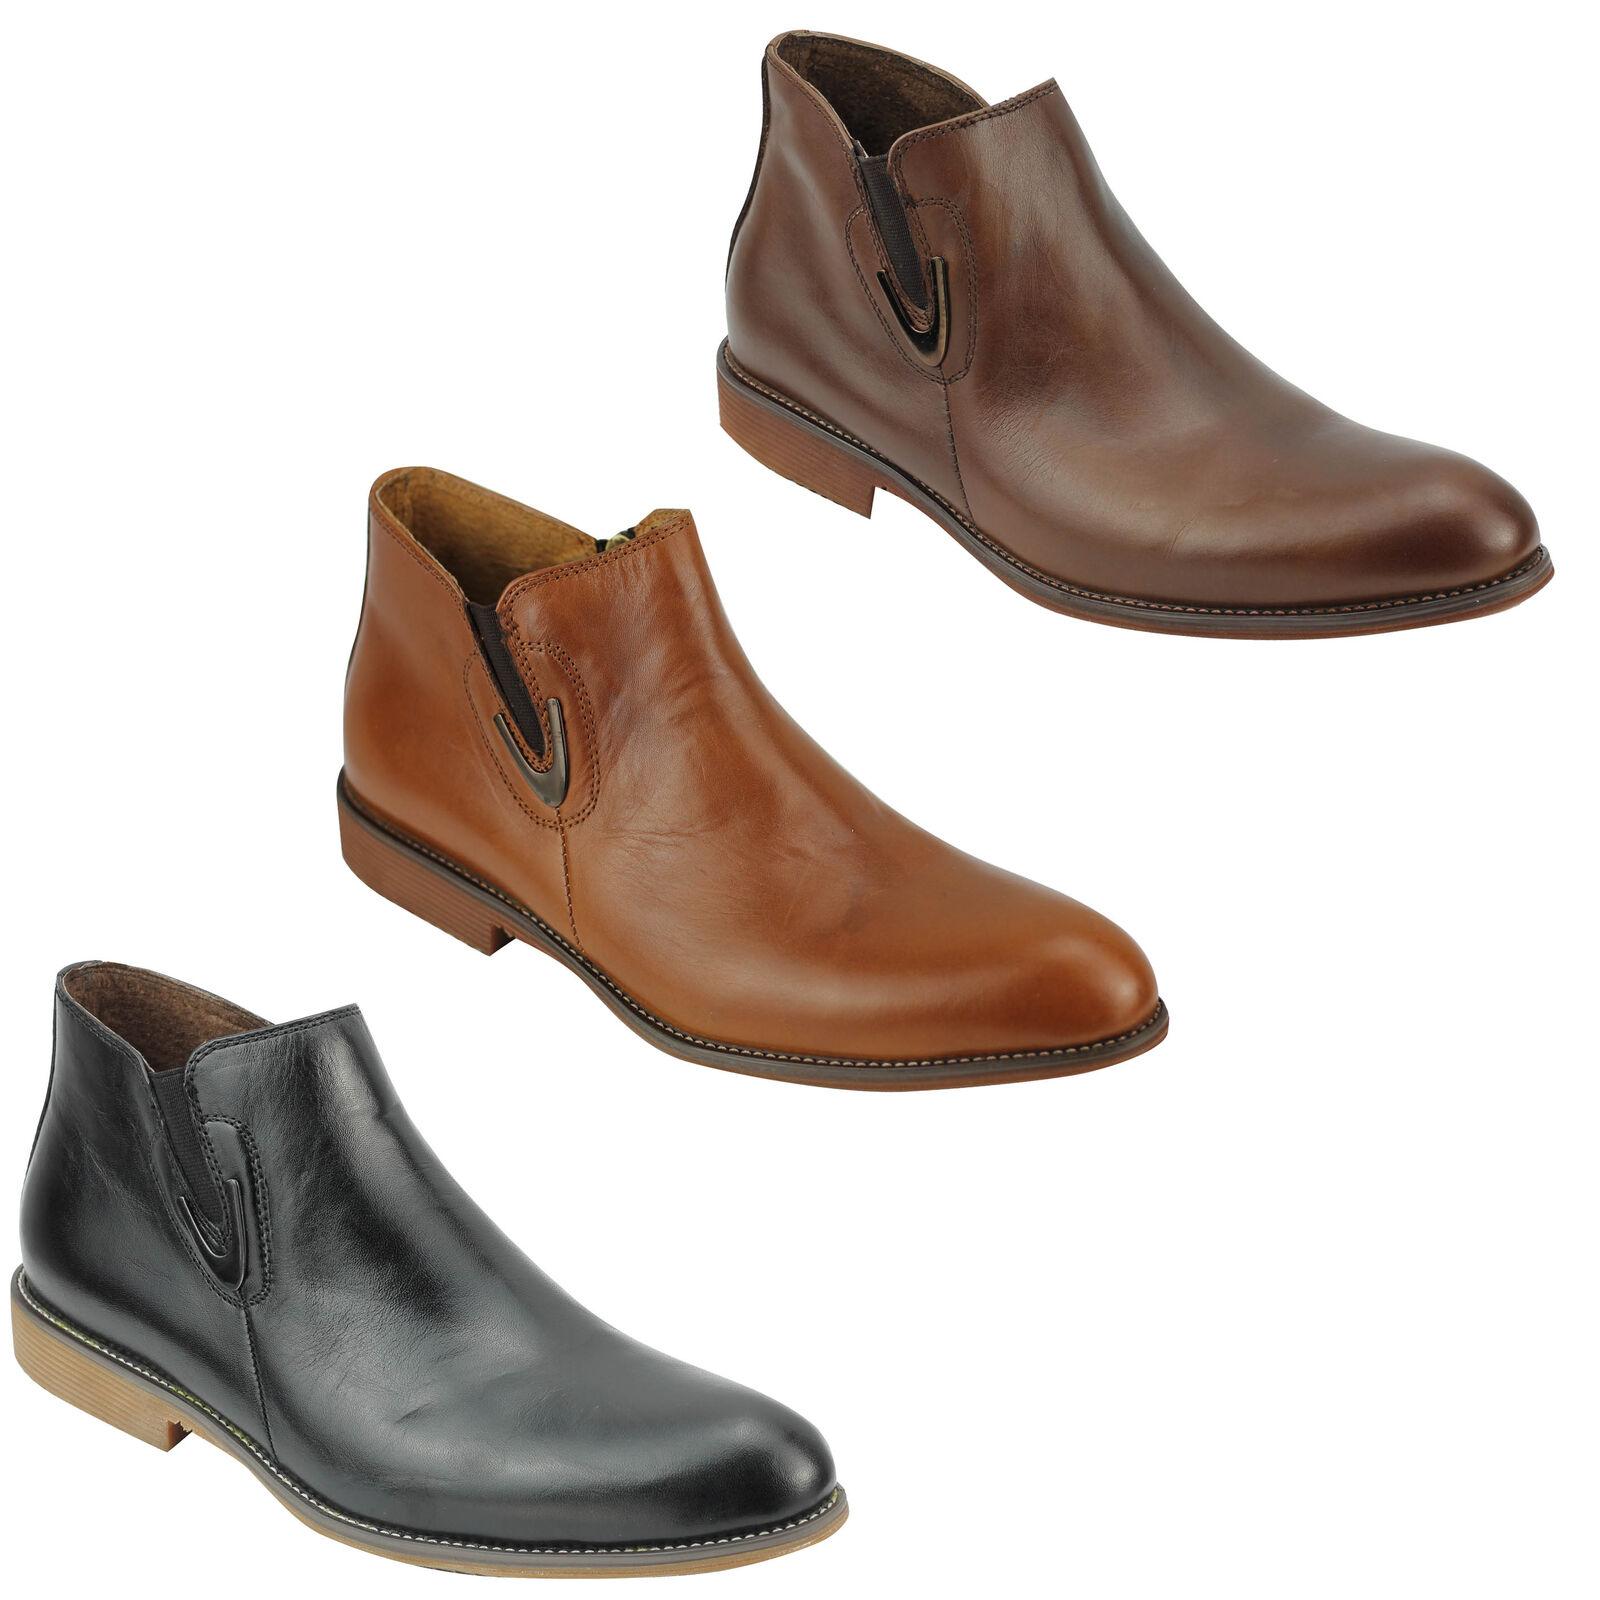 NV UOMO VERA PELLE CHELSEA Vintage Scarpe Classico Zip Alla Caviglia Scarpe Vintage Nero Marrone f5956d